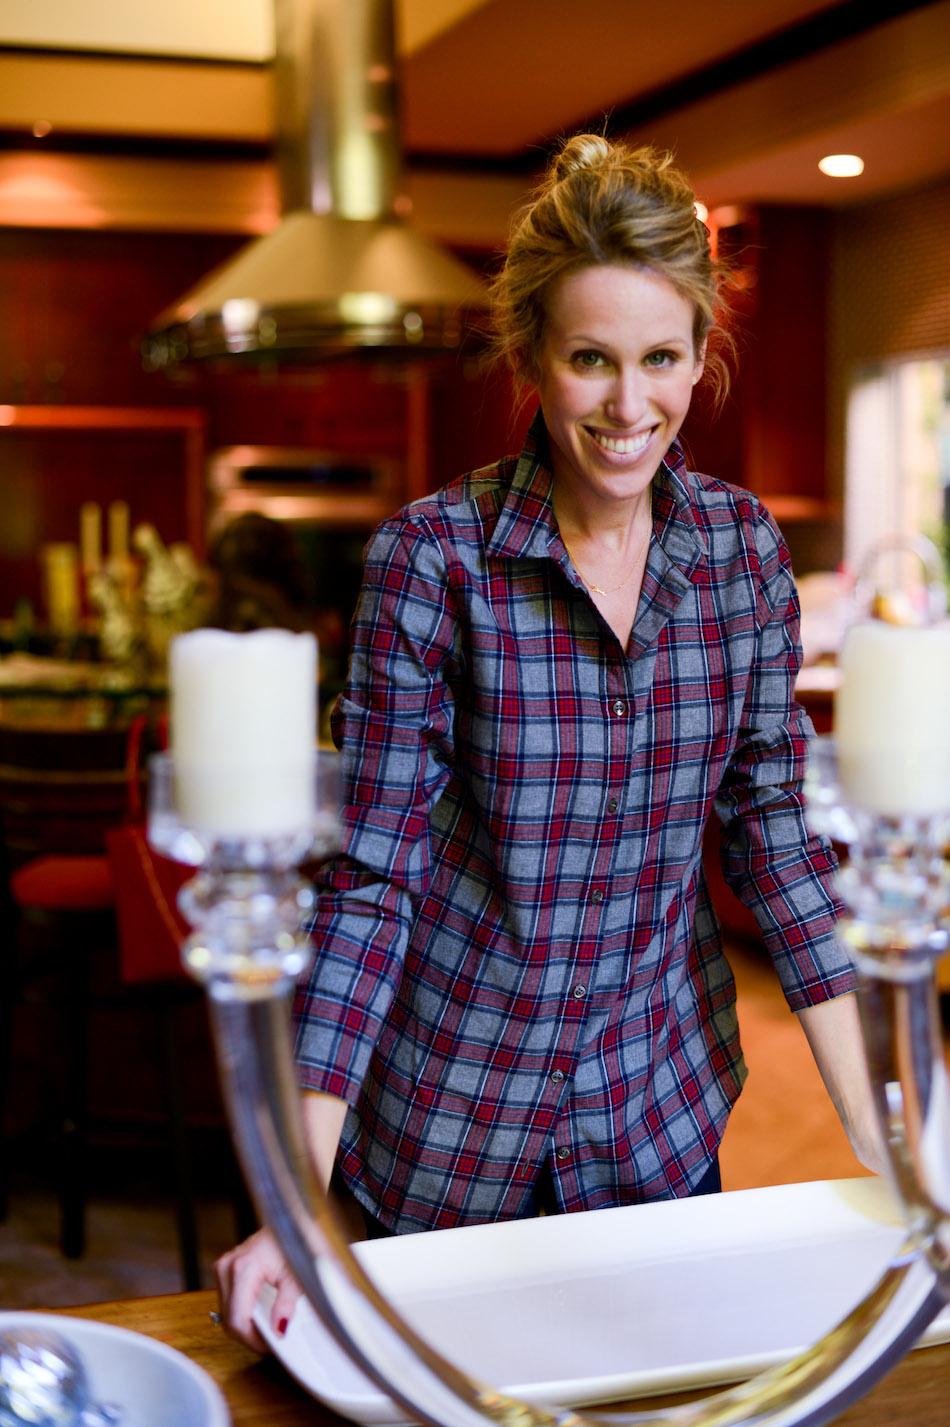 Fashionable Hostess preps Pudding Tray